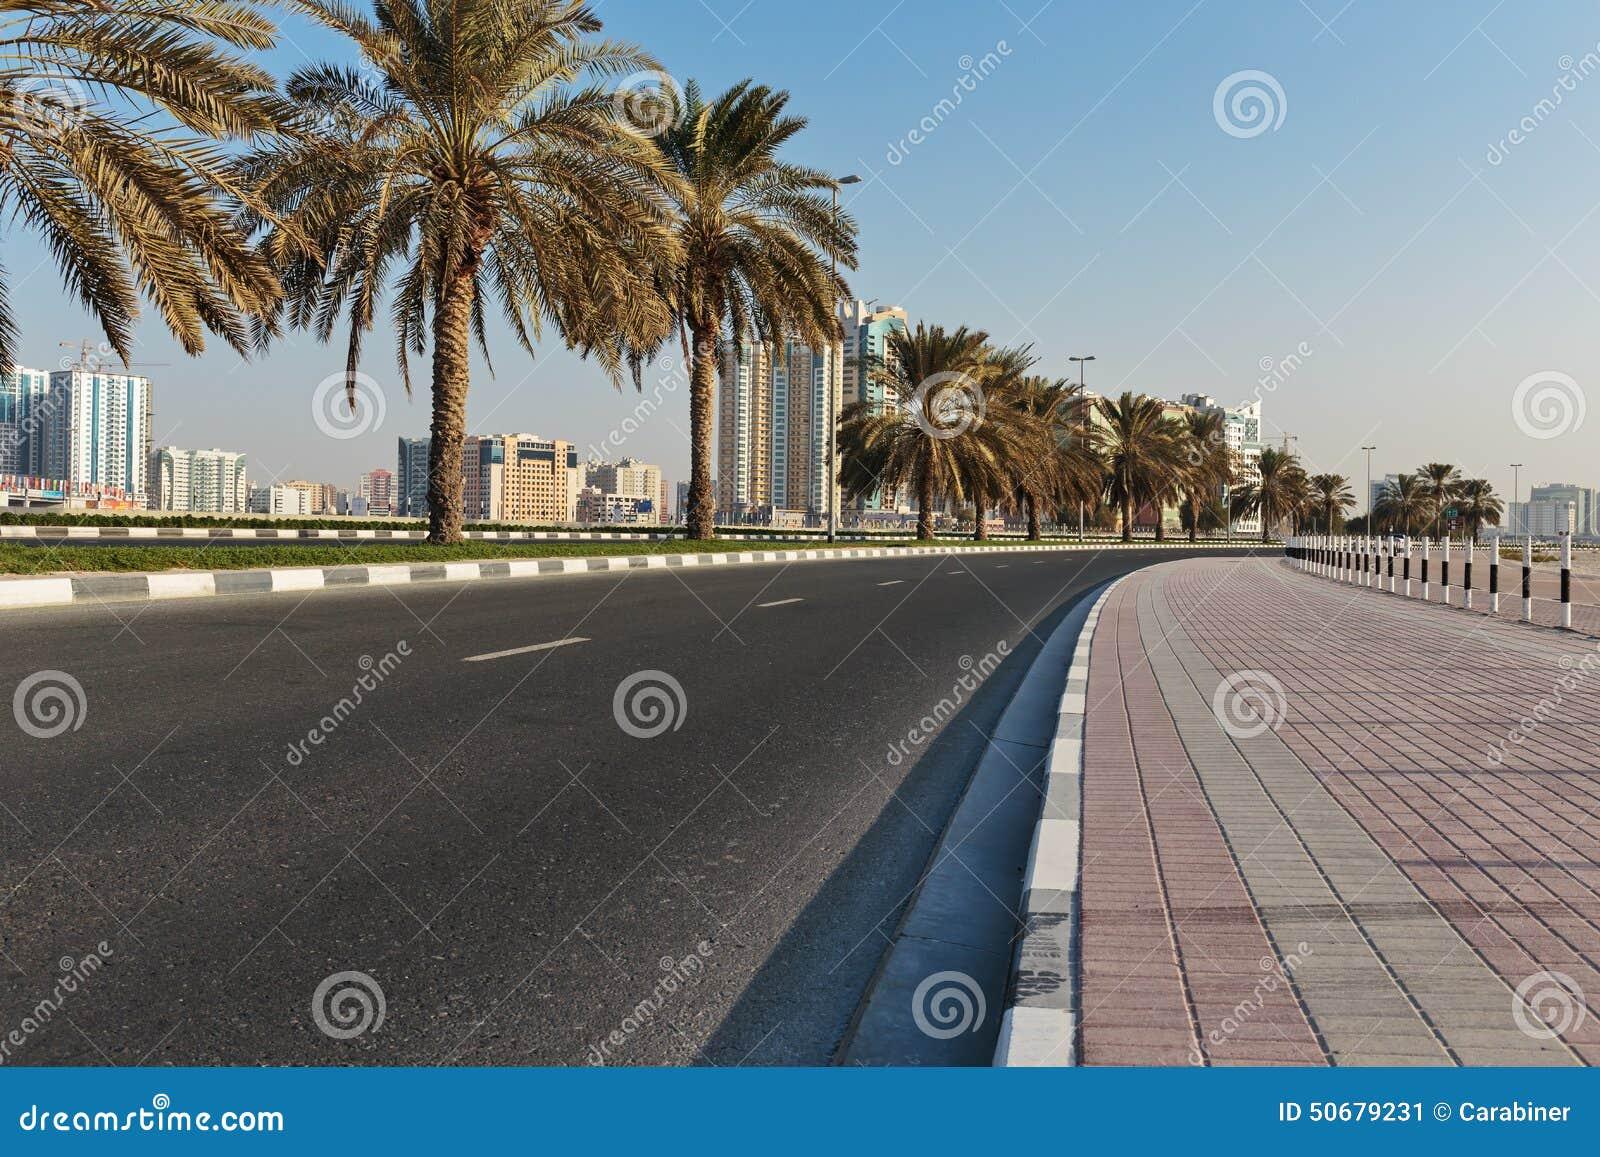 Download 沙扎的江边的全视图 库存图片. 图片 包括有 颜色, 横向, arabel, 蓝色, 可耕的, 半岛, 透视图 - 50679231